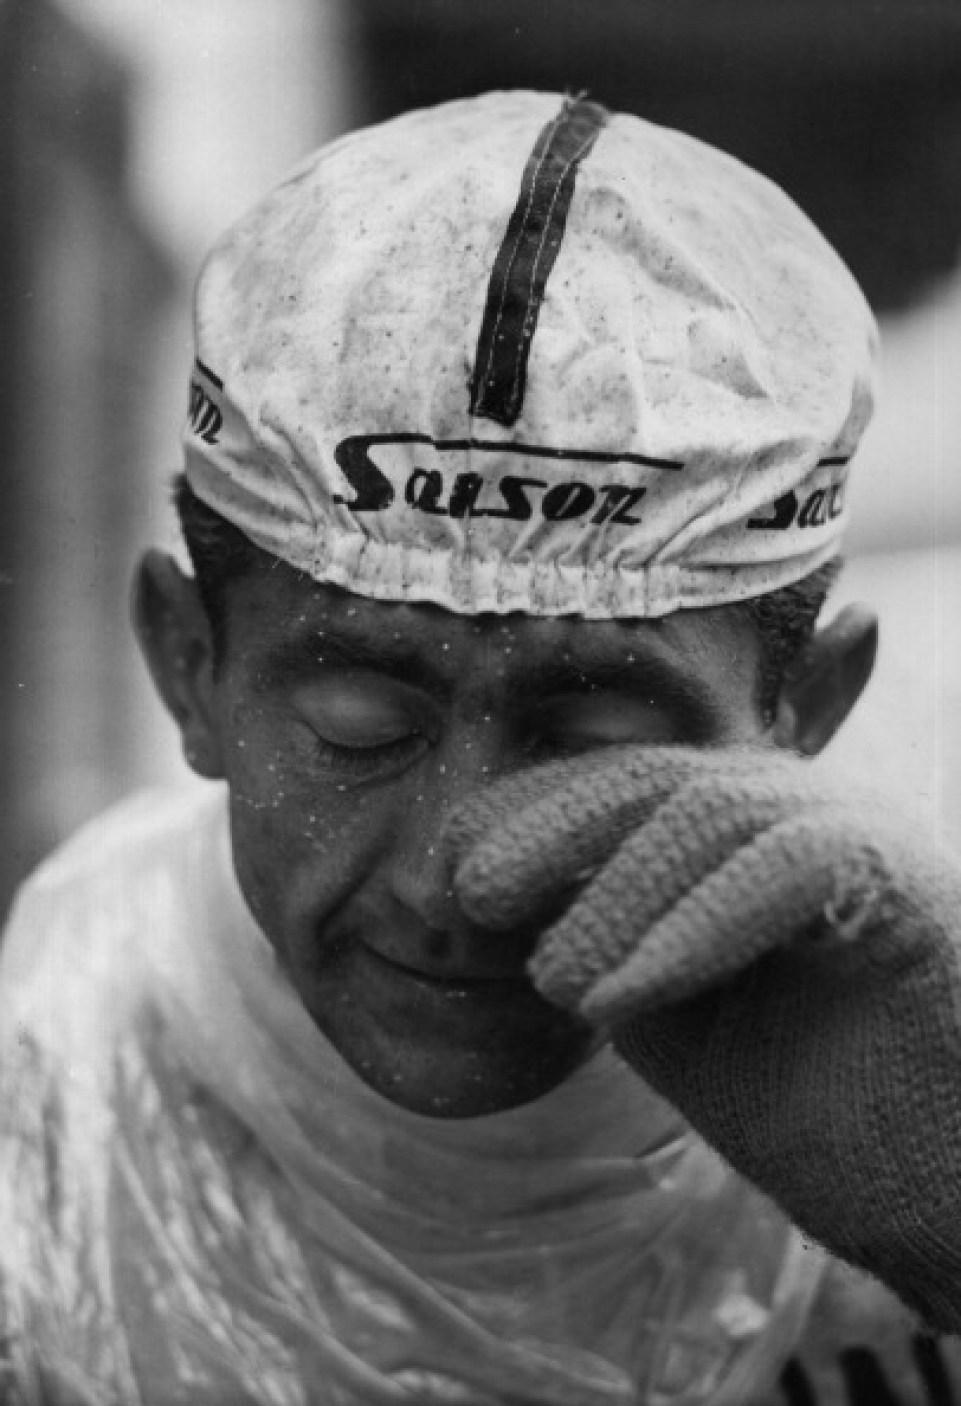 The Italian cyclist Italo Zilioli has just finished the 20th stage of the Giro d'Italia Madesimo-Stelvio. Stelvio, 3rd June 1965 (Photo by Giorgio Lotti/Mondadori Portfolio via Getty Images)